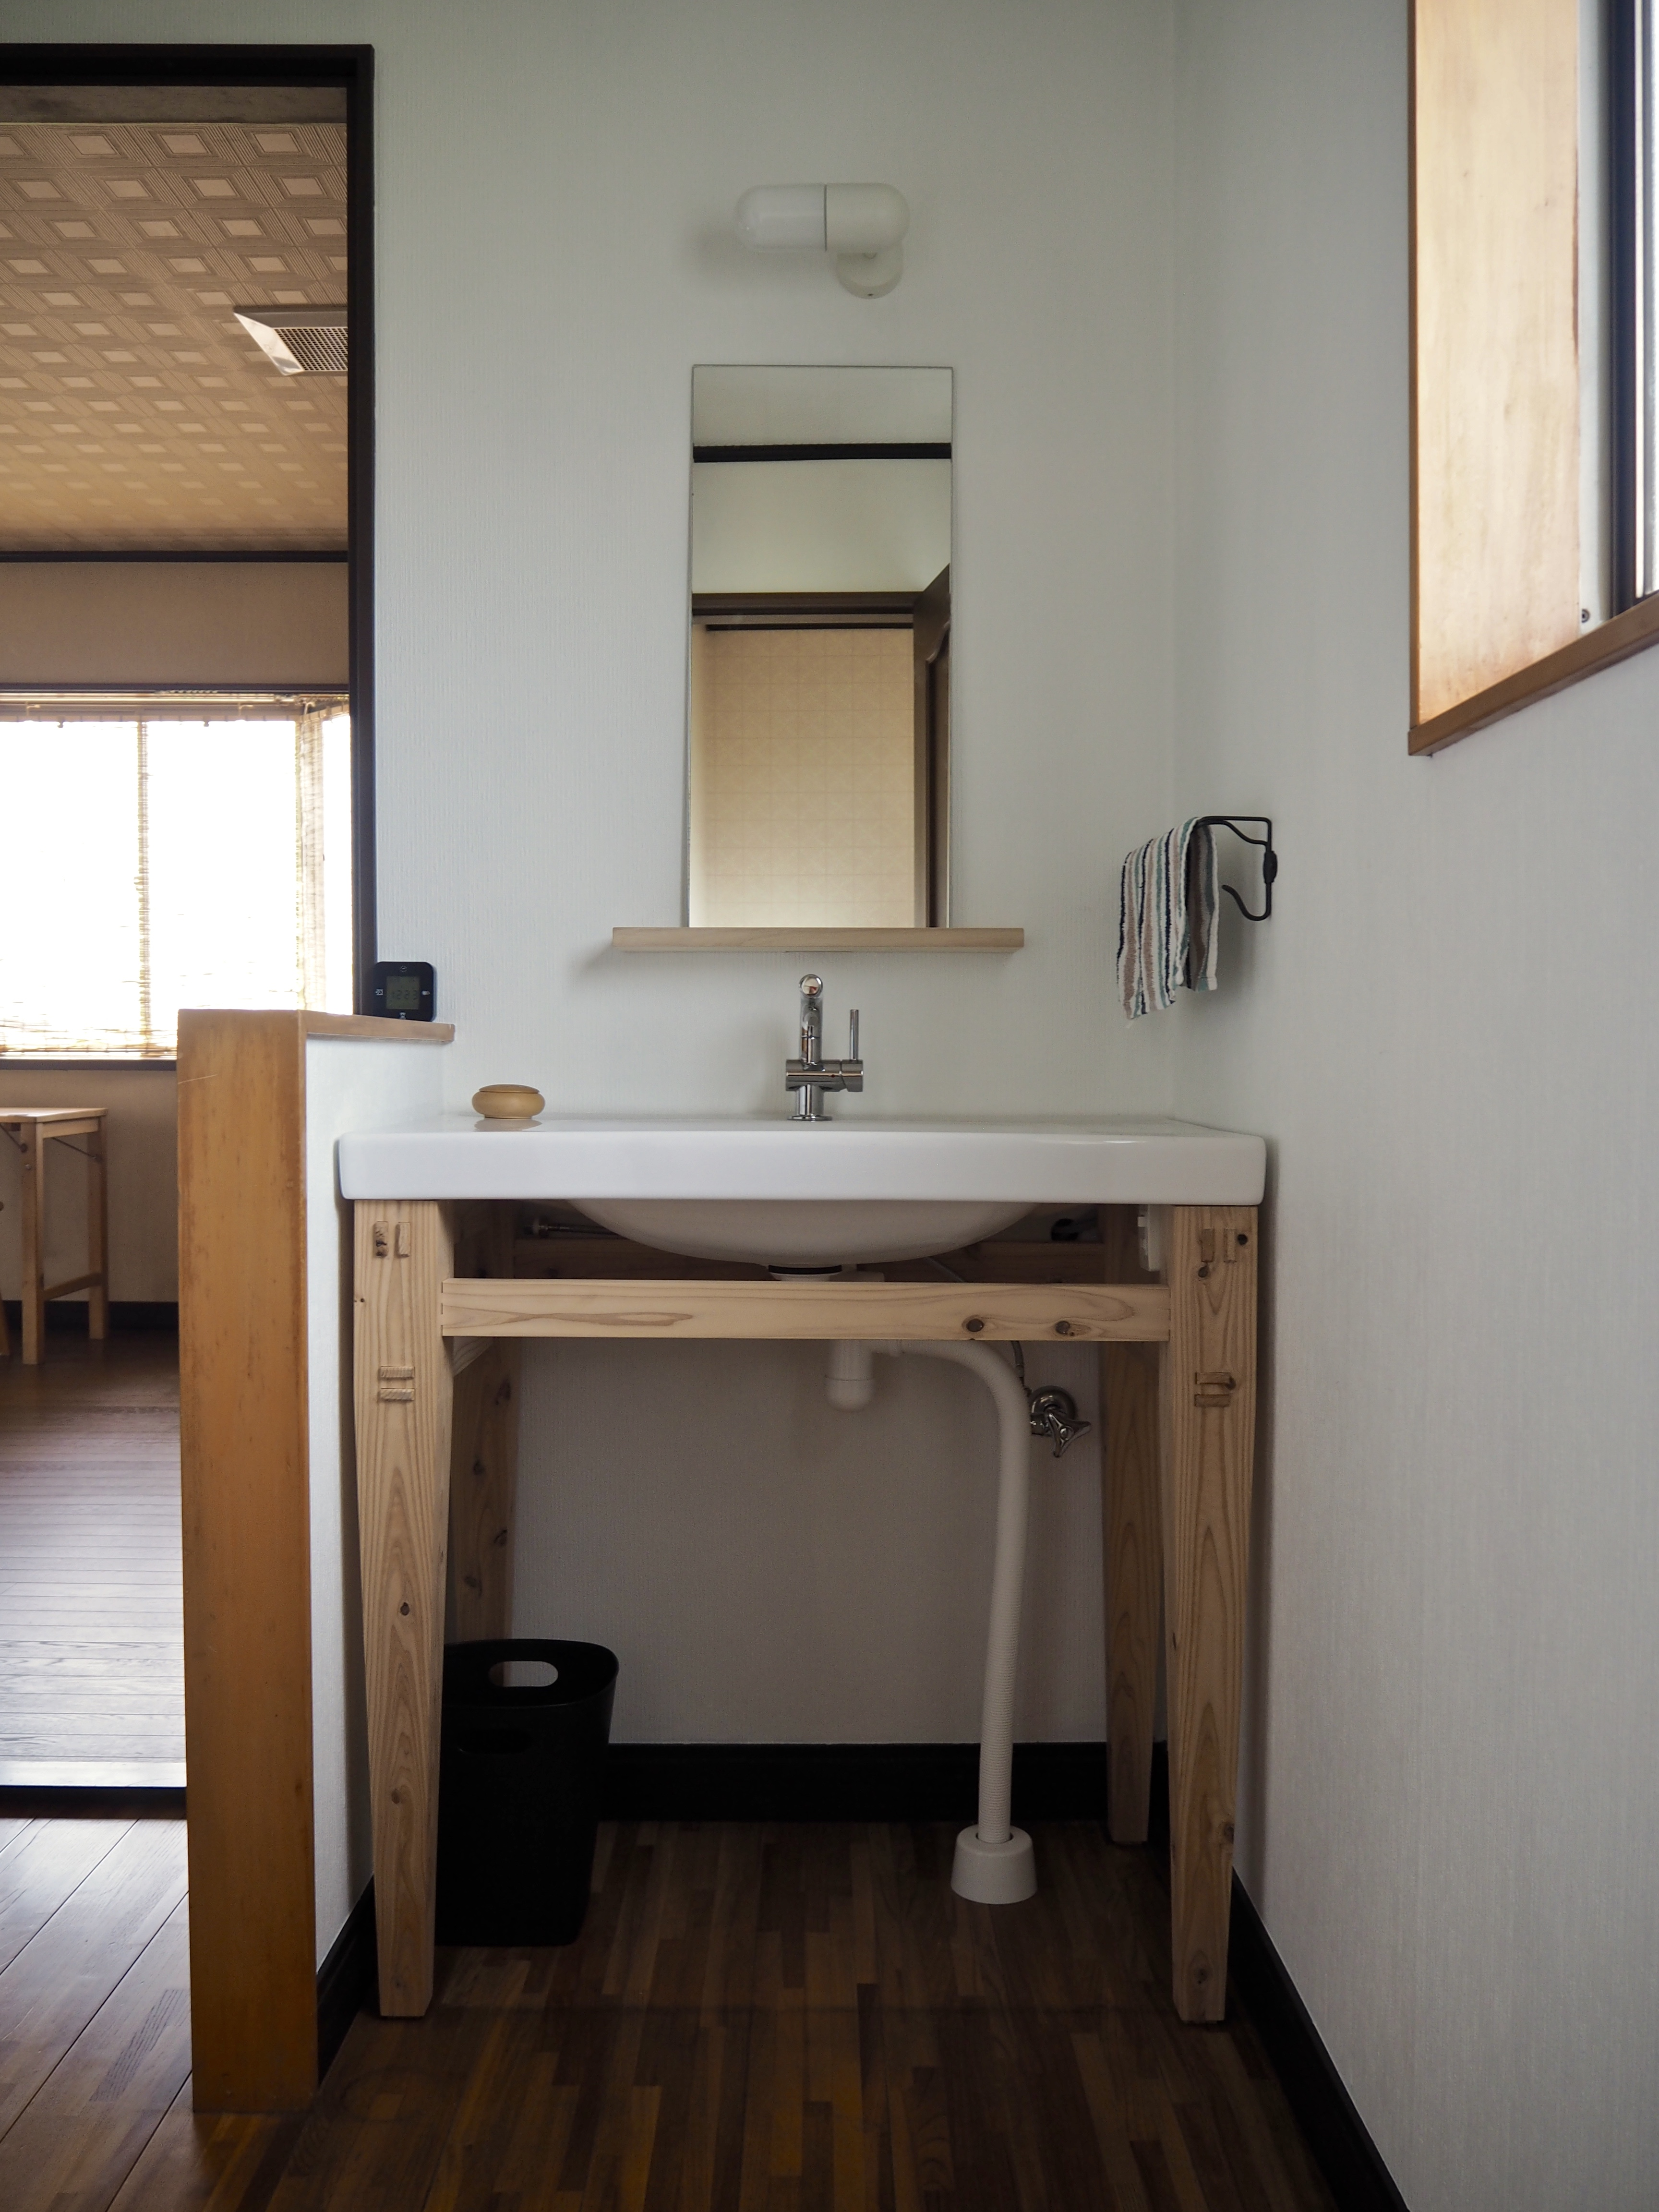 Yumi's new sink